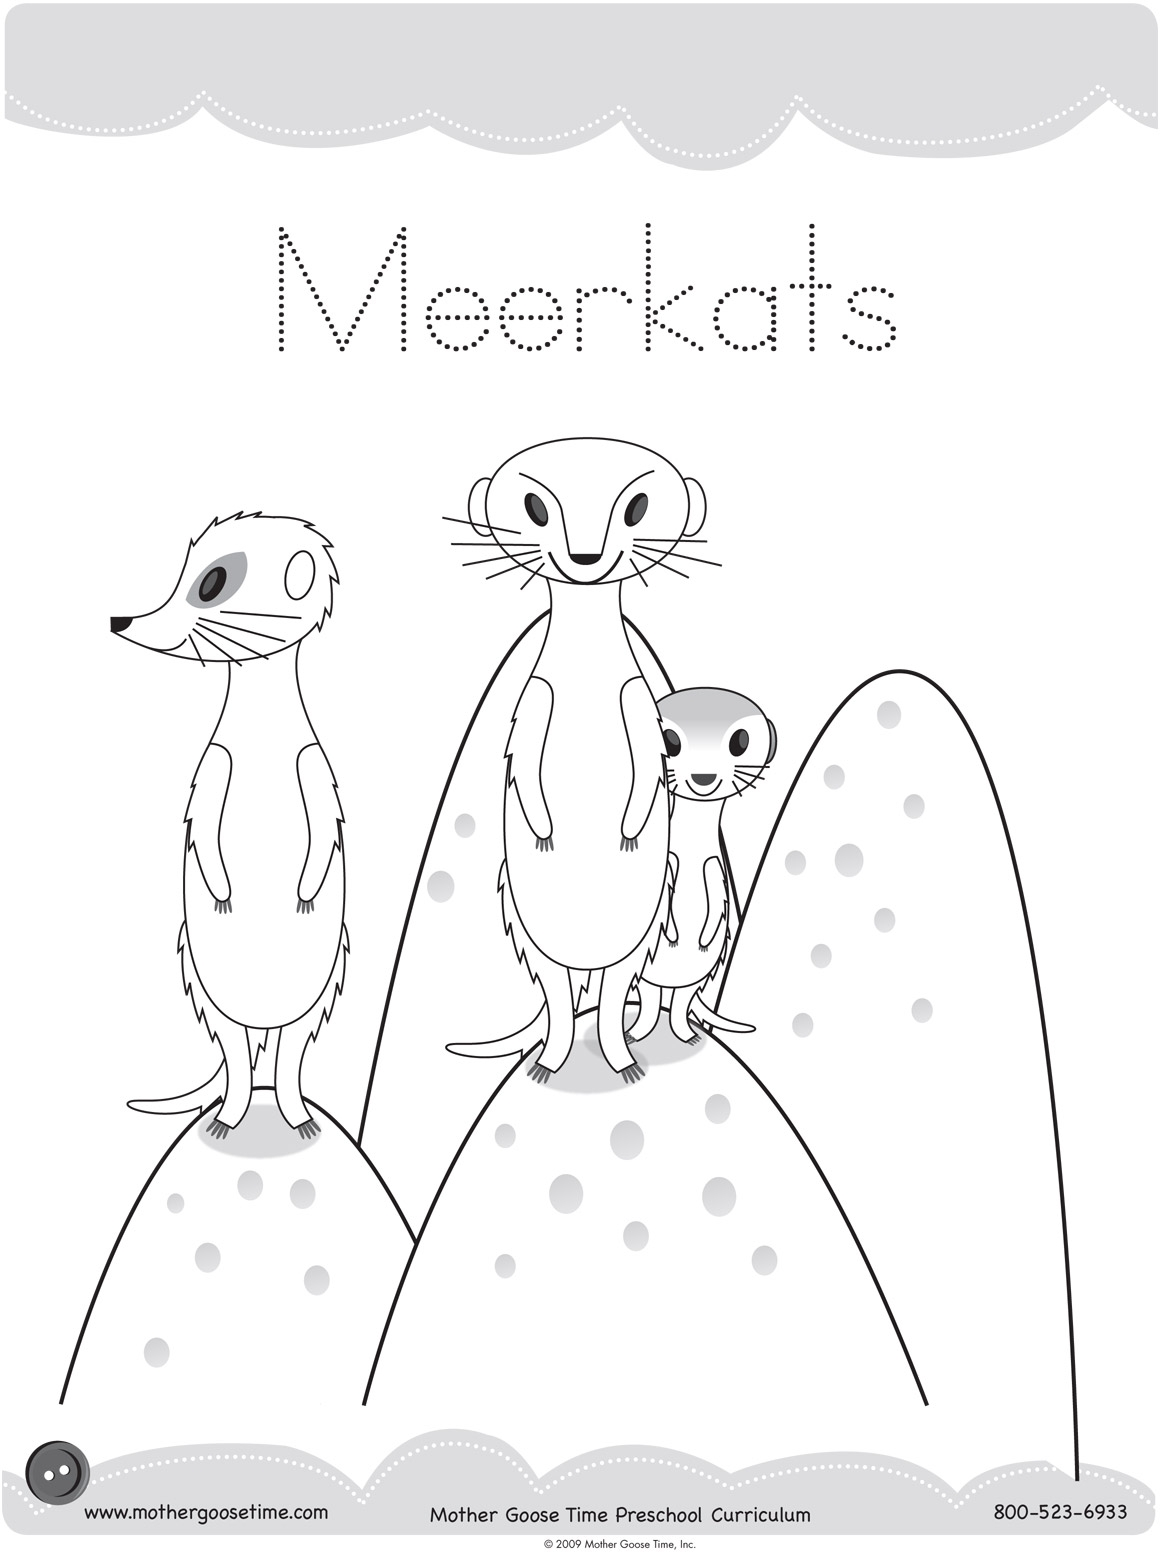 Meerkat Coloring Page At Getcolorings